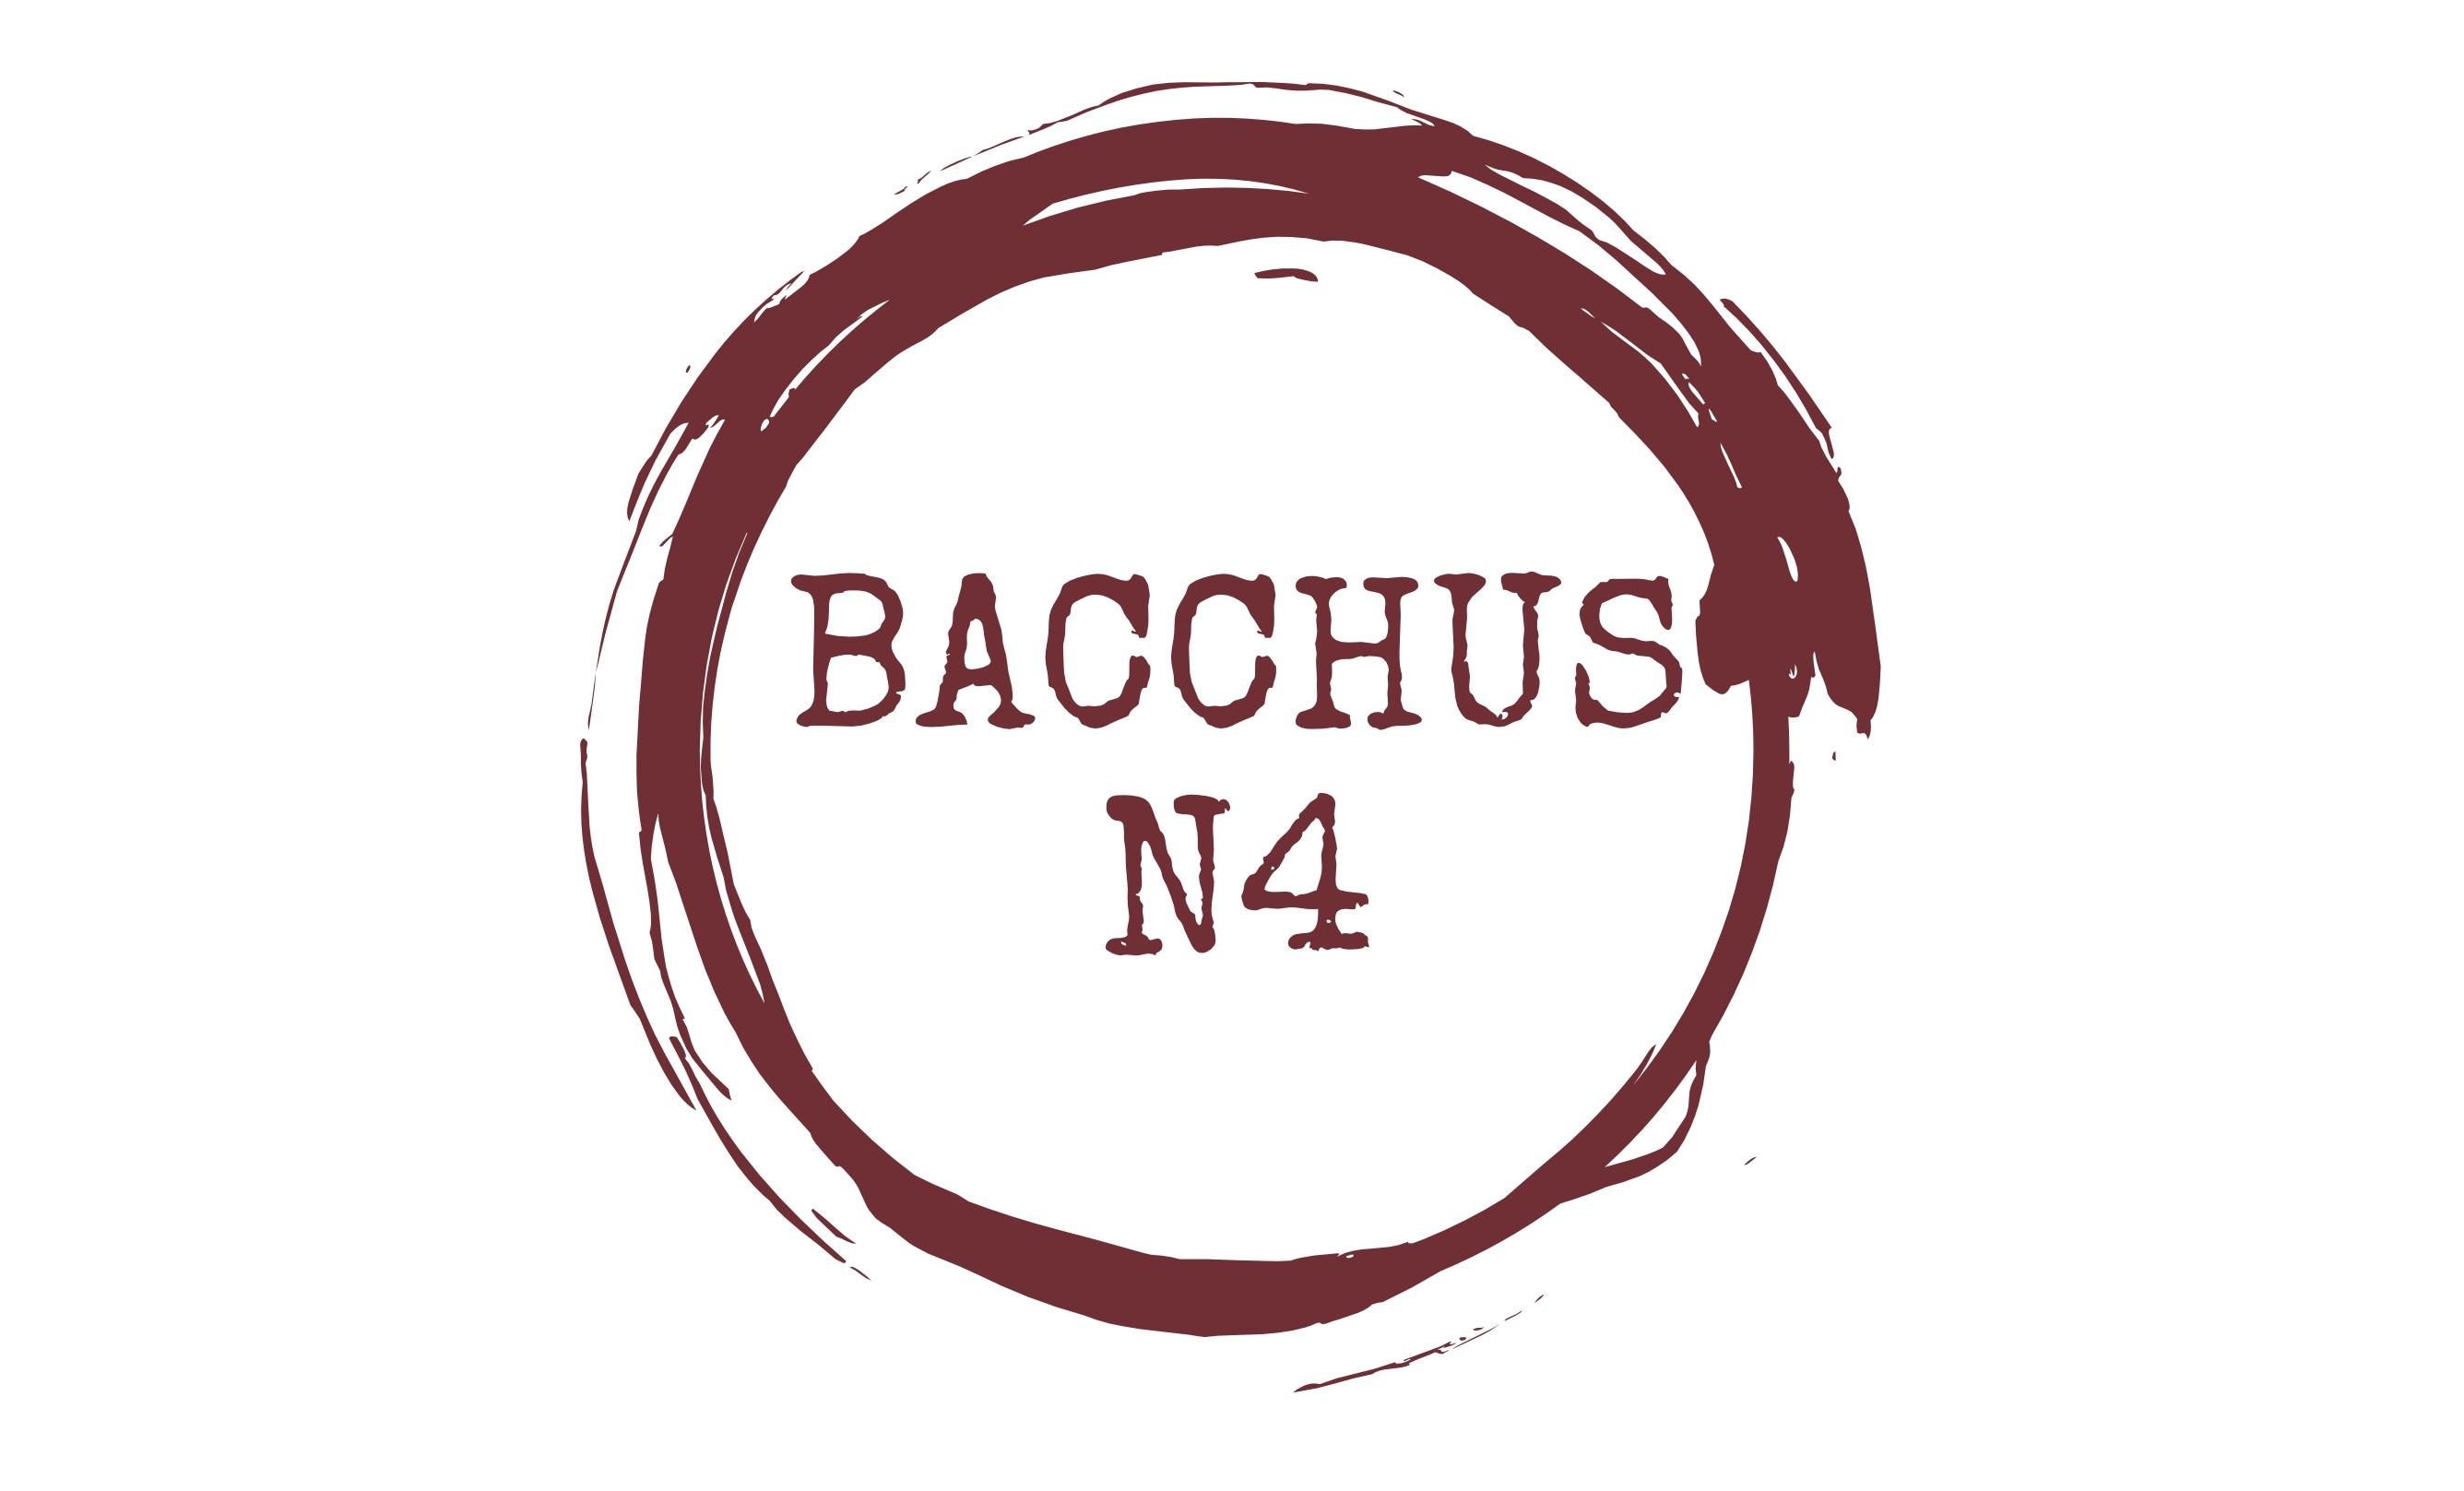 BACCHUS LONDON LIMITED